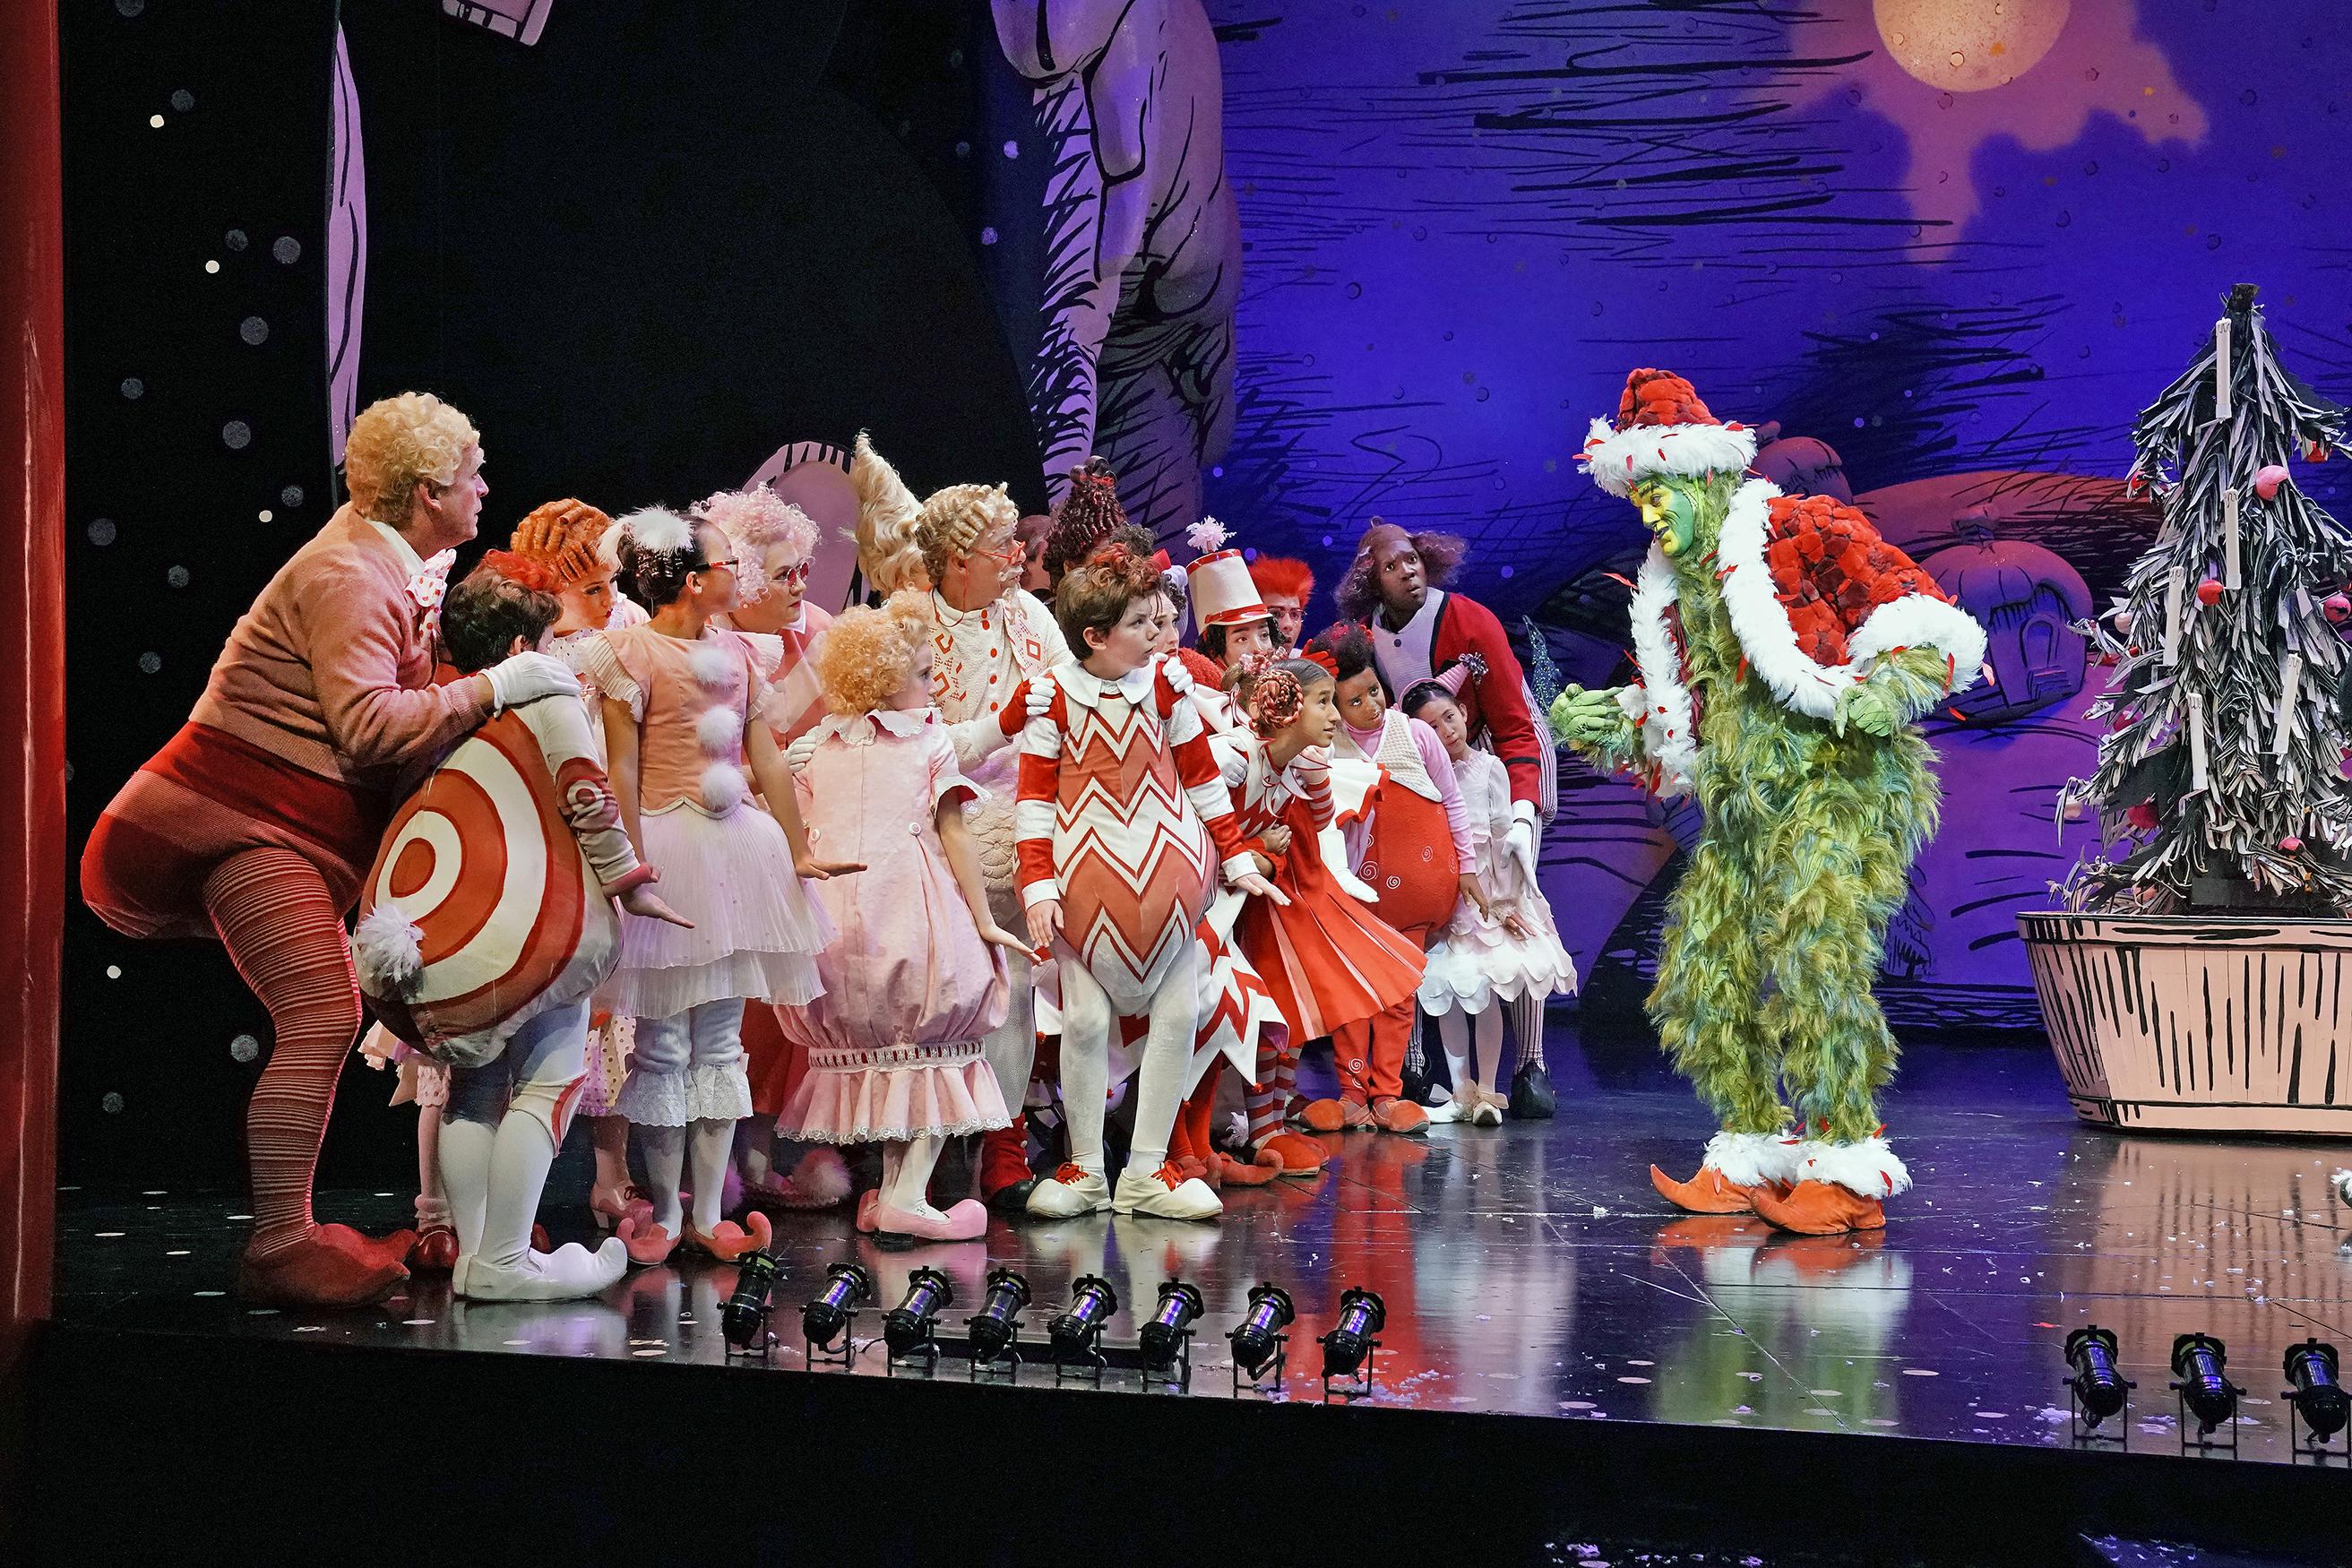 How The Grinch Stole Christmas Cast 2019 Dr. Seuss's How the Grinch Stole Christmas! 2018 | The Old Globe